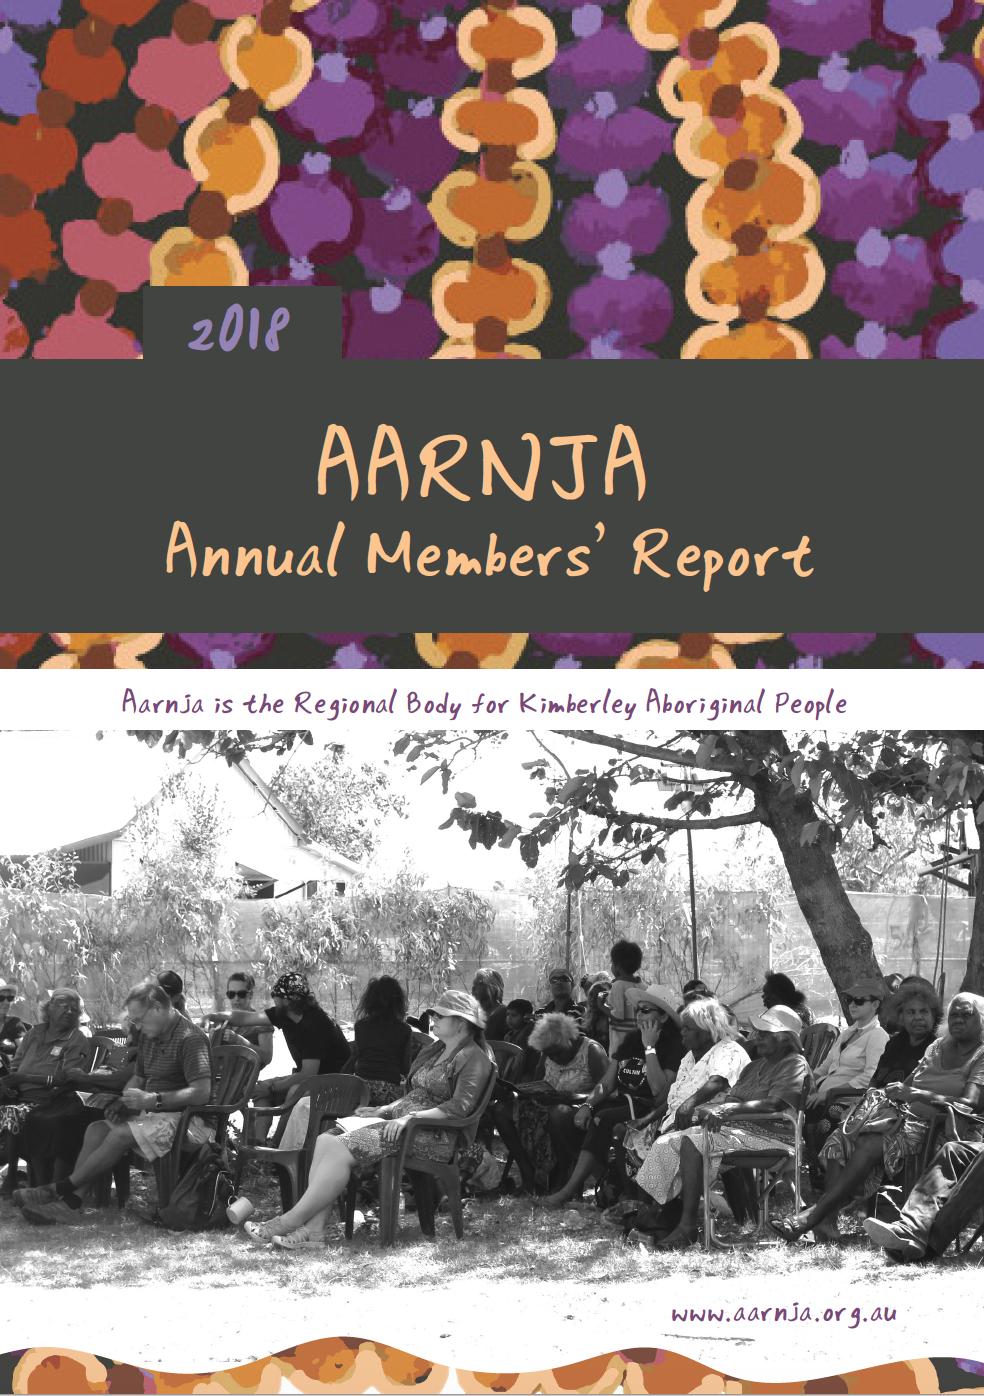 Aarnja Members' Report 2018